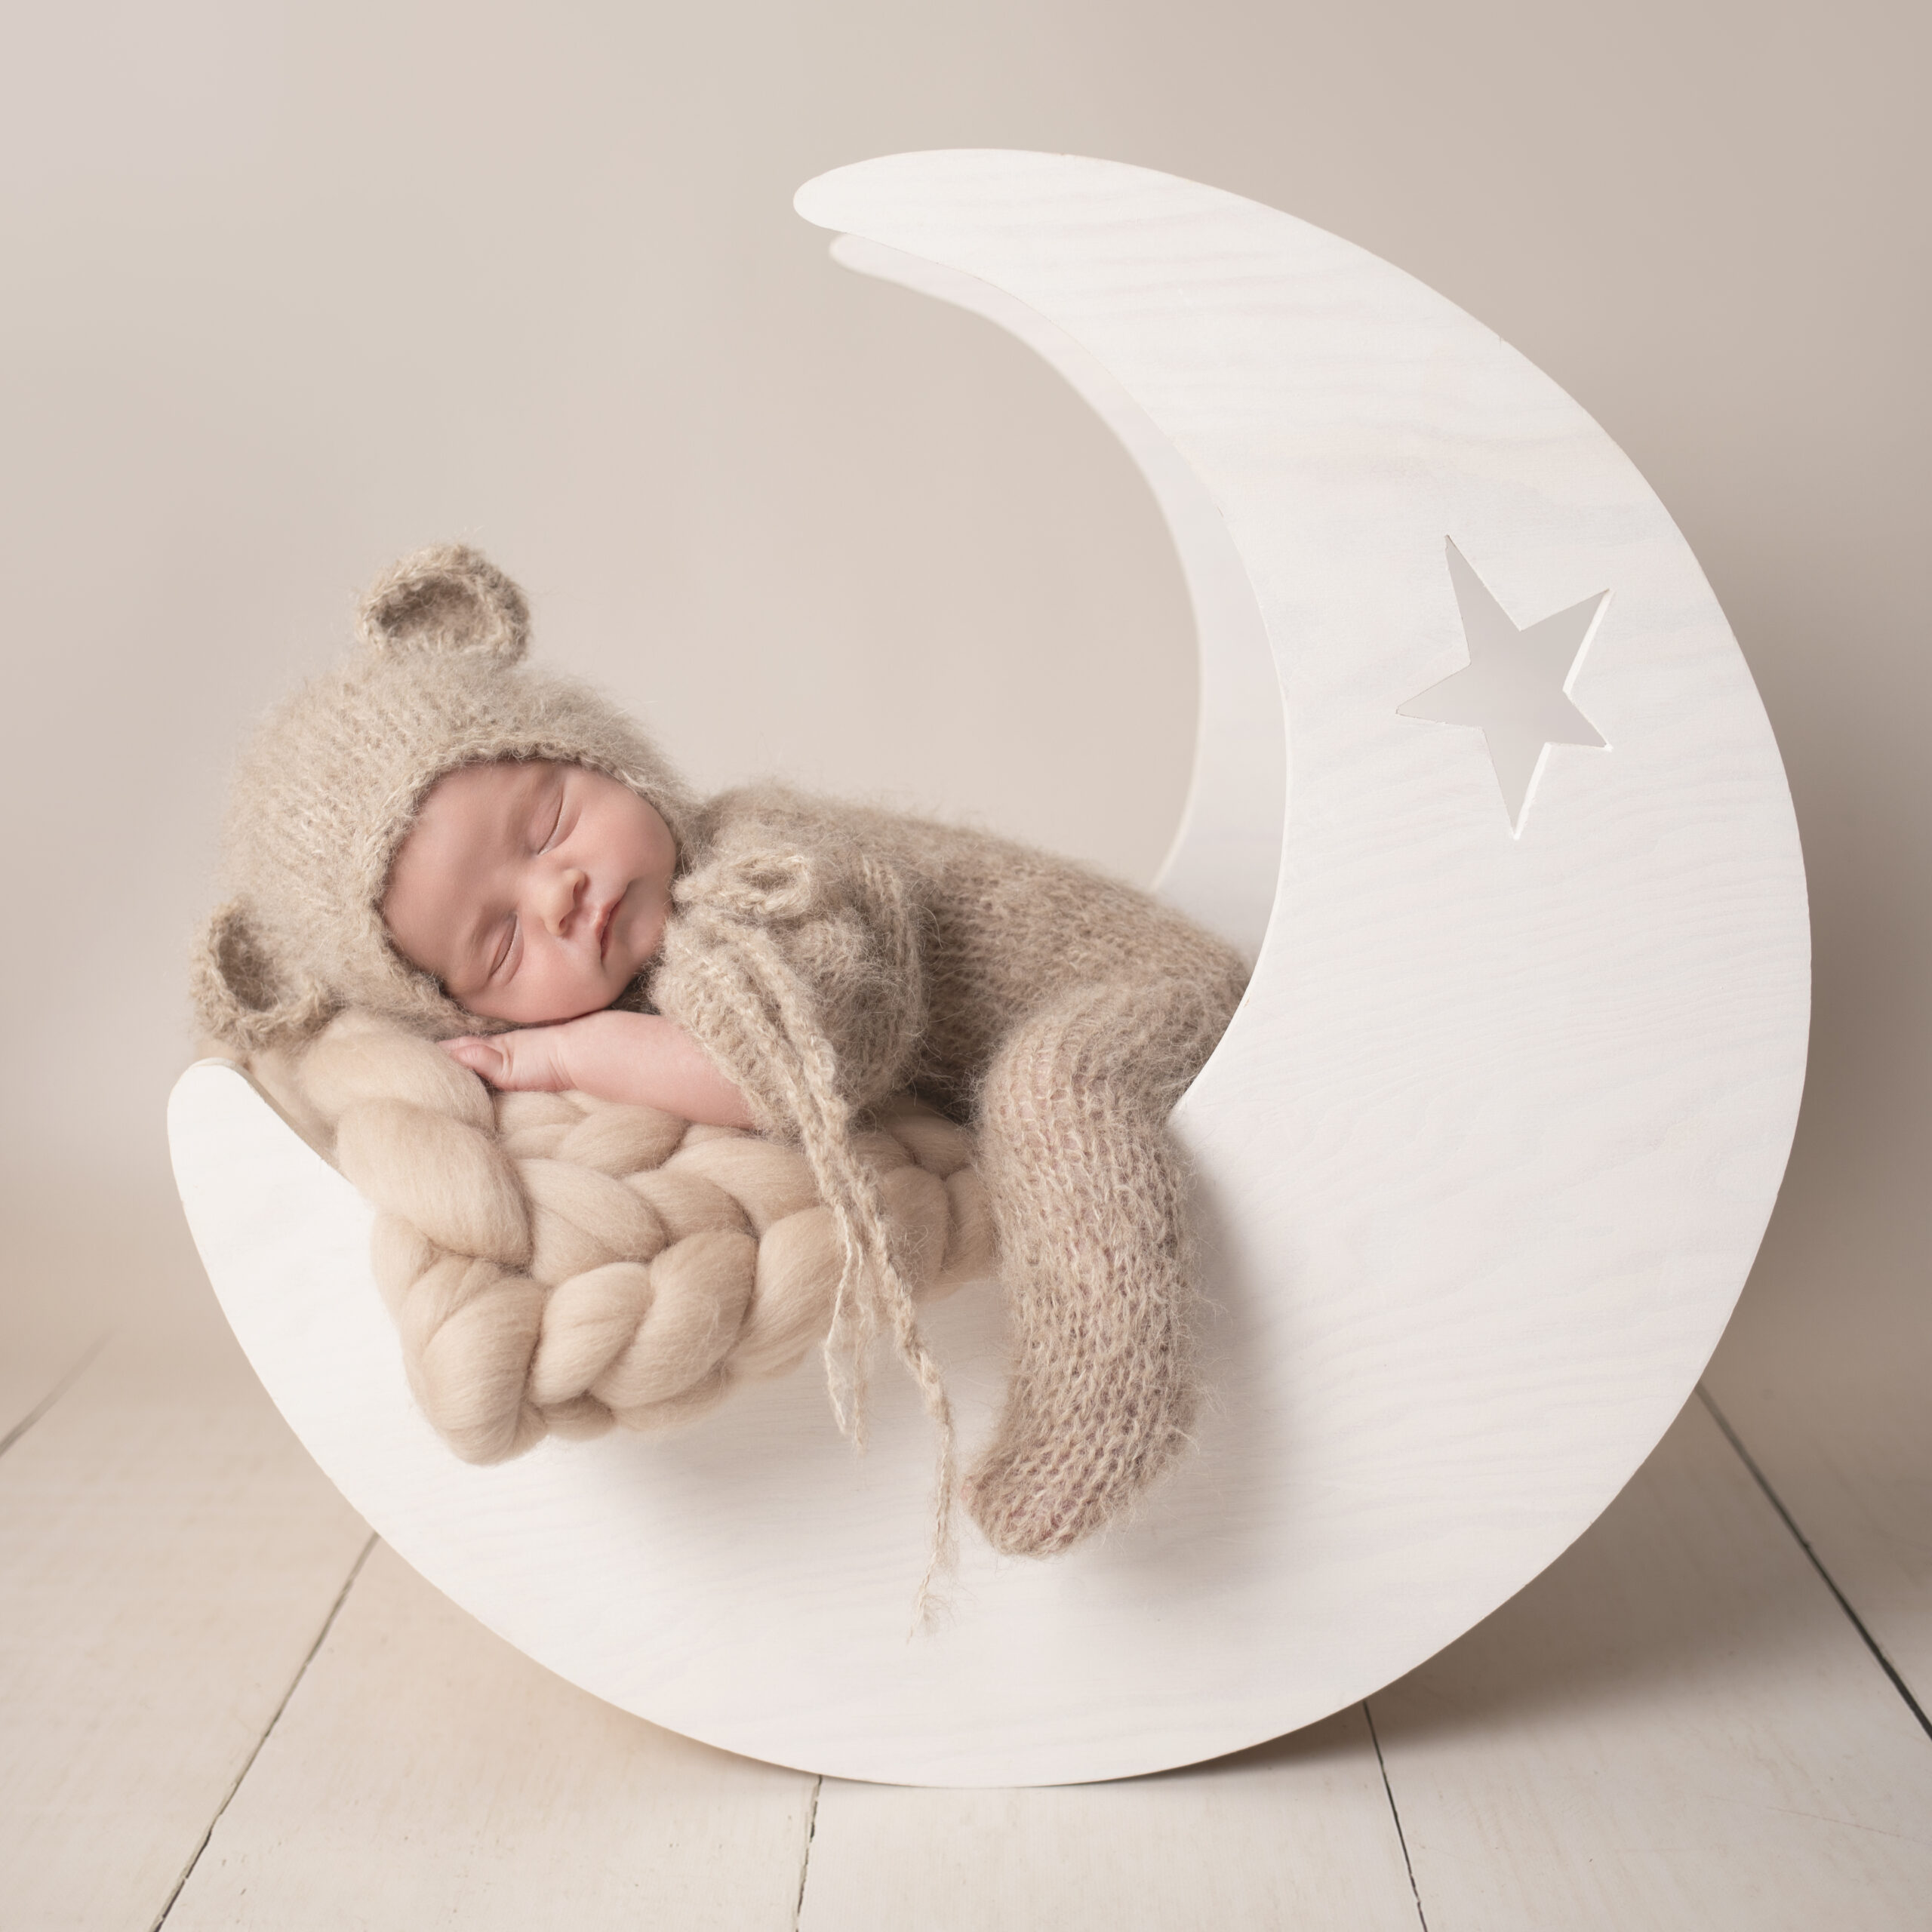 Newborn photoshoot north west baby teddy bear in moon